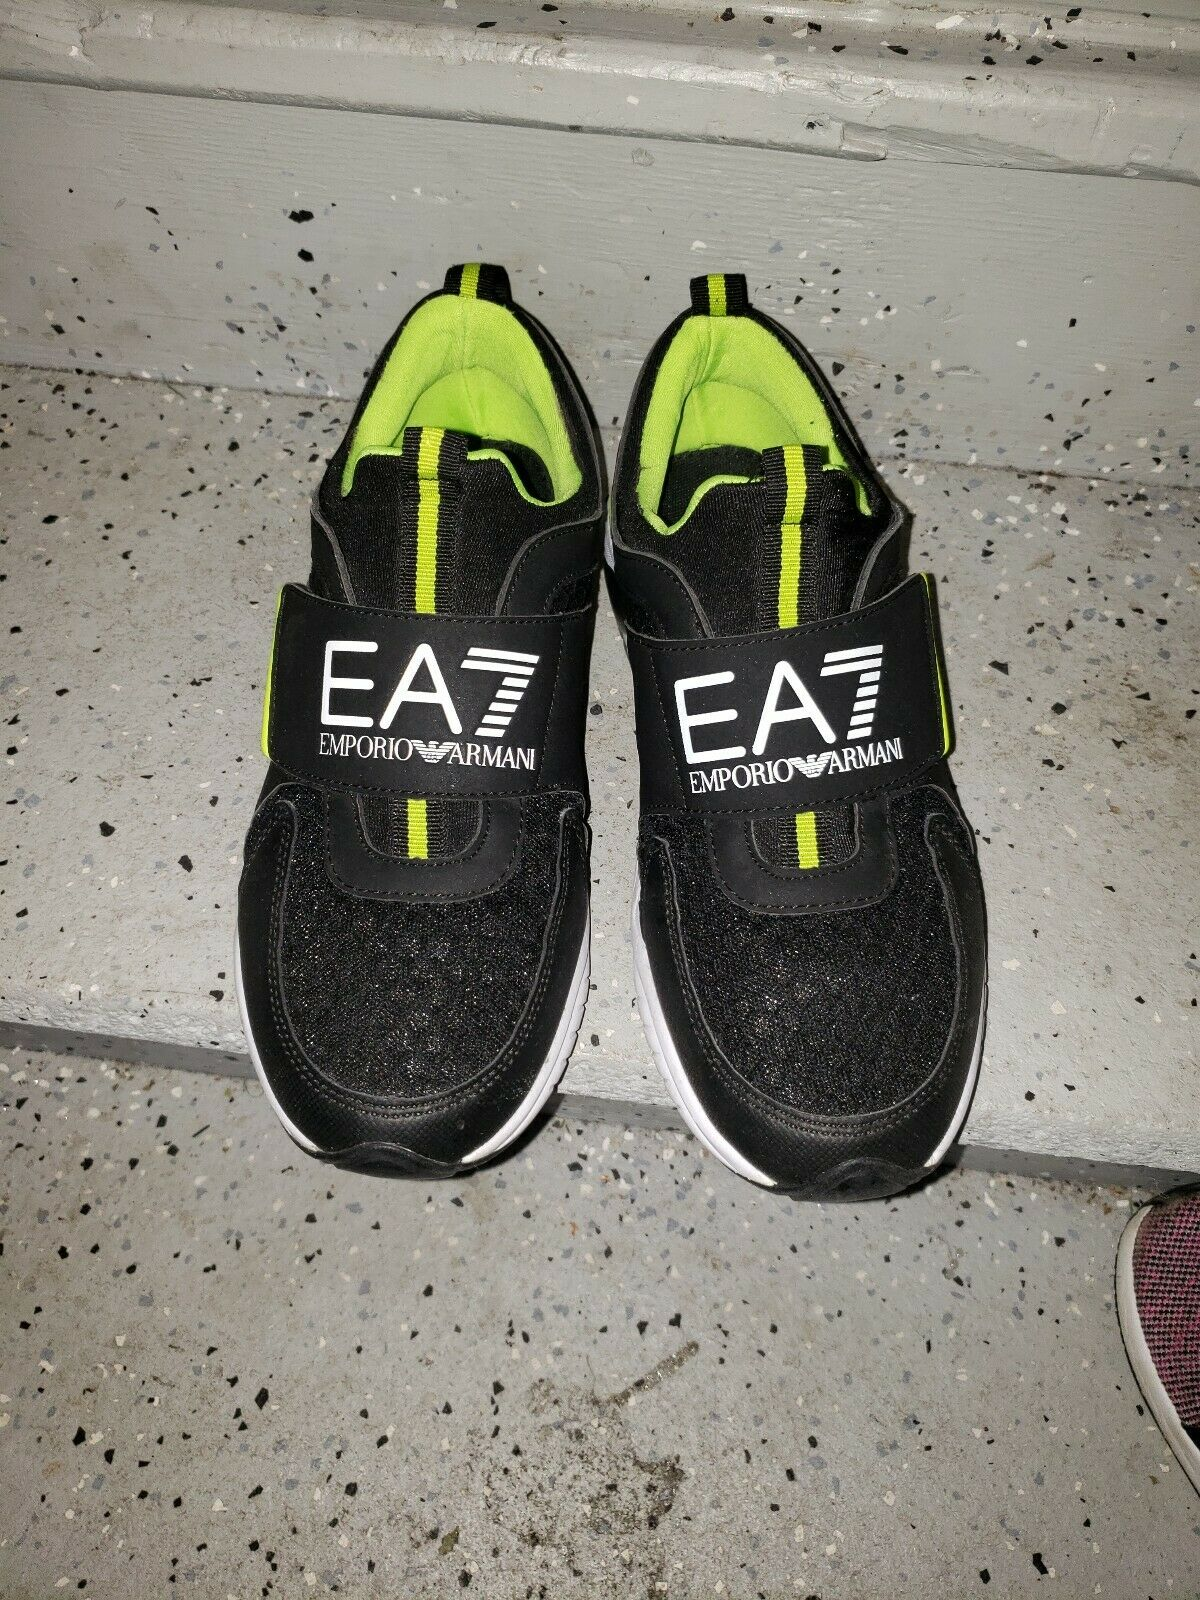 Emporio armani ea7 shoes. Size 7